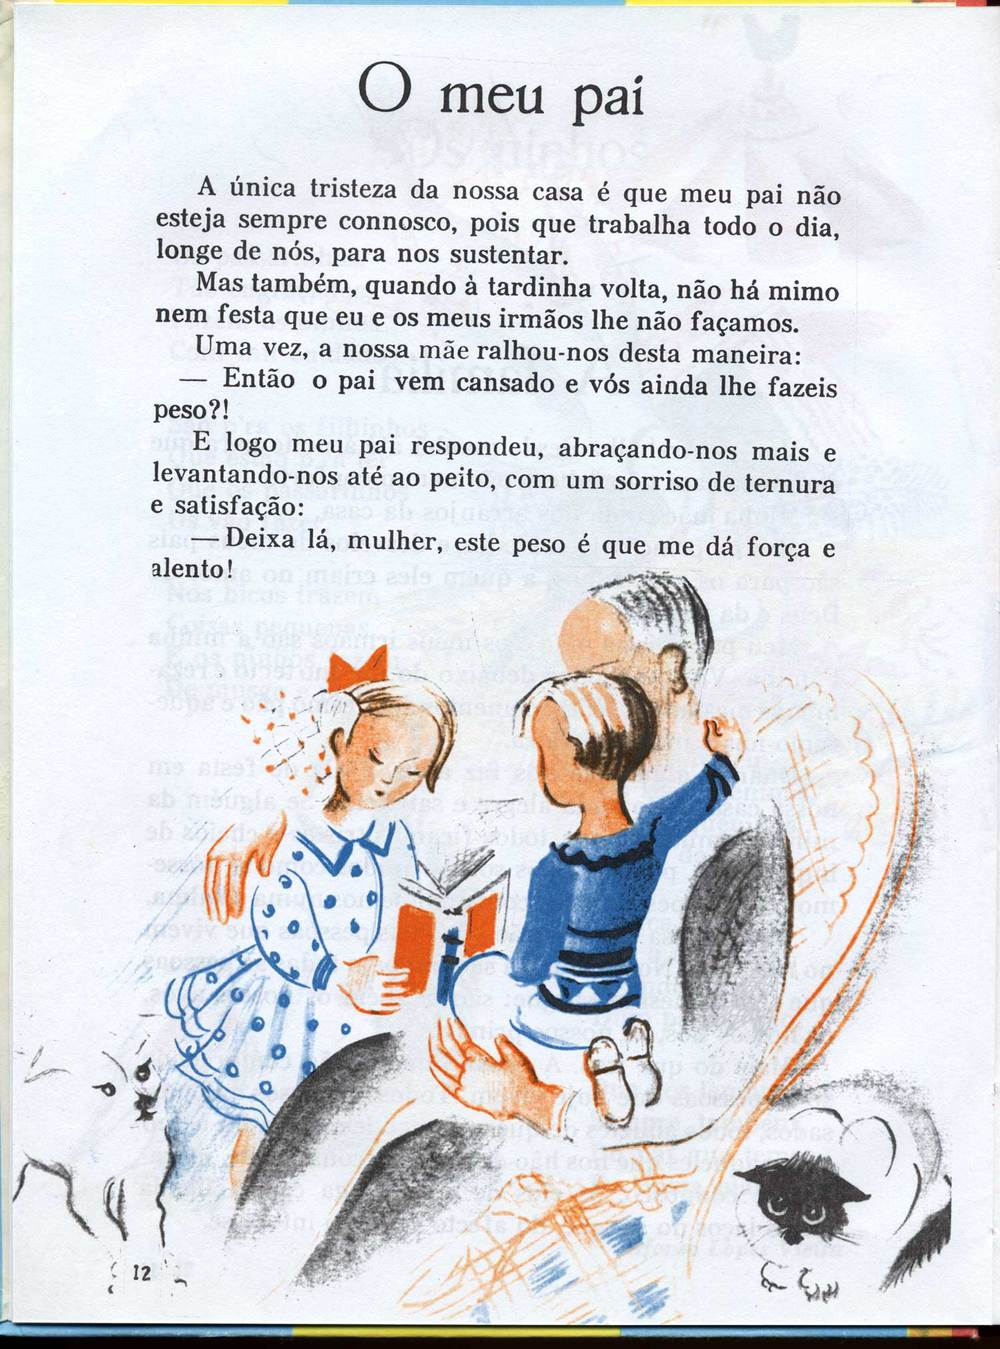 pt_textbk2_017_OLivroDaSegundaClasse_1958.jpg